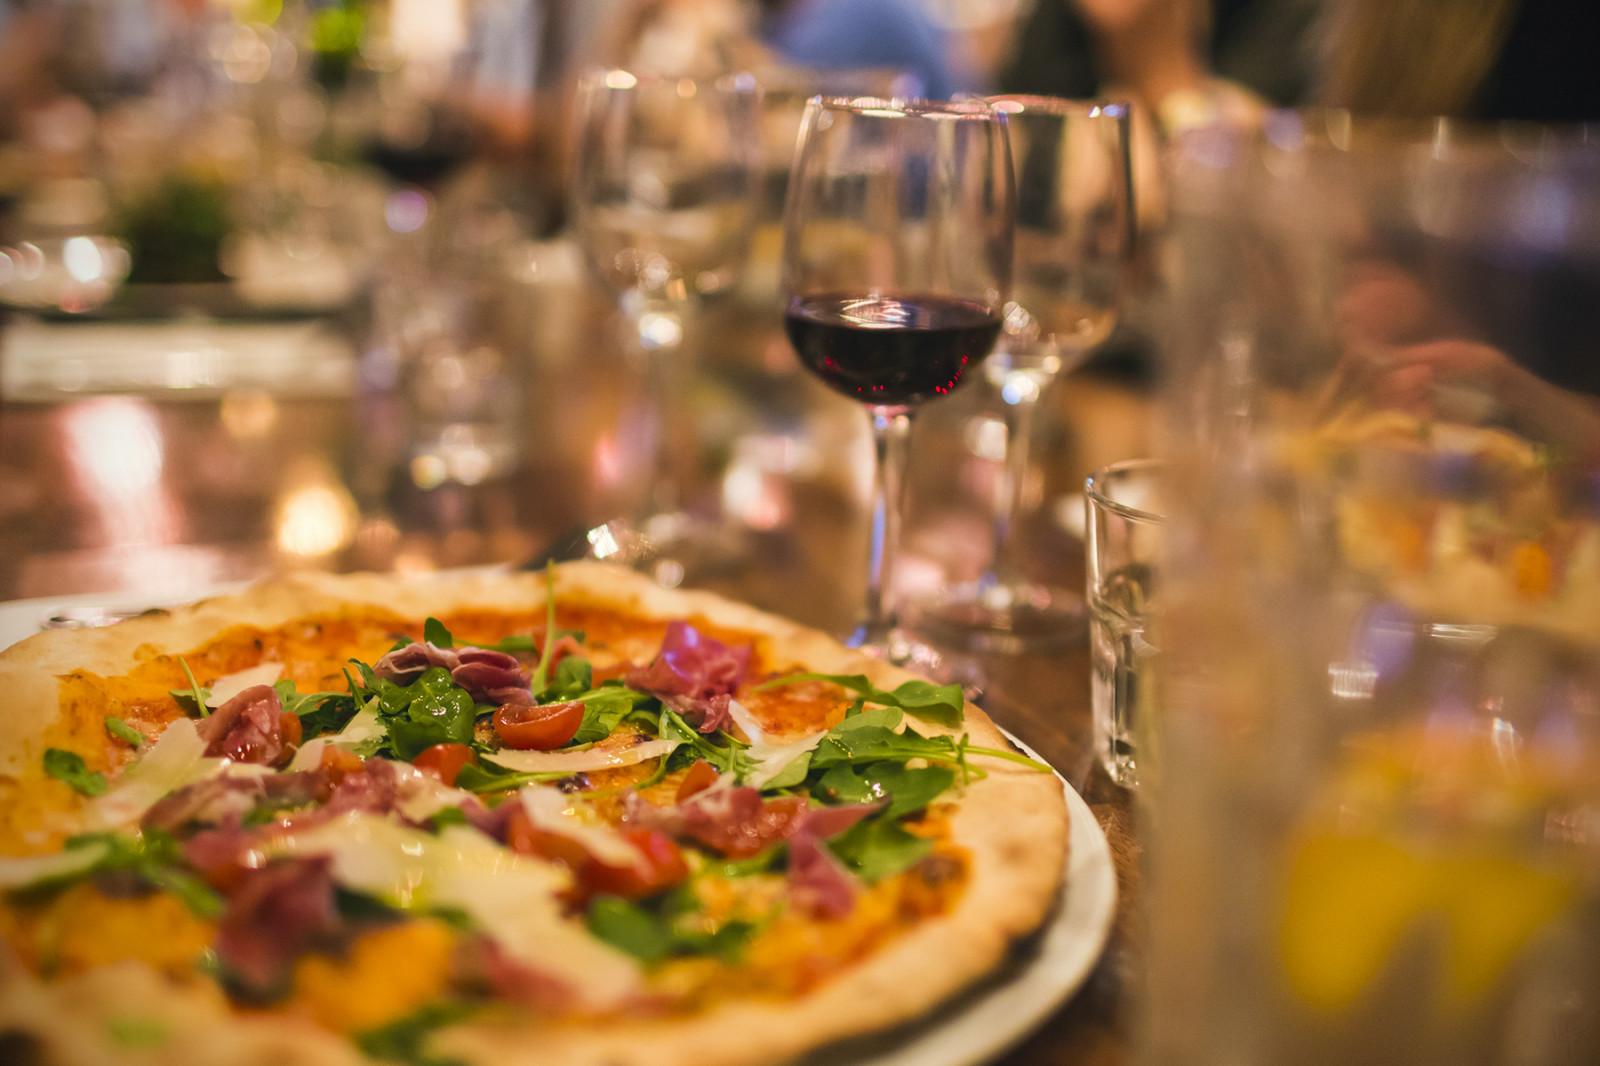 Hintergrundbilder : Lebensmittel, Käse, Wein, Getränk, Glas, Salat ...